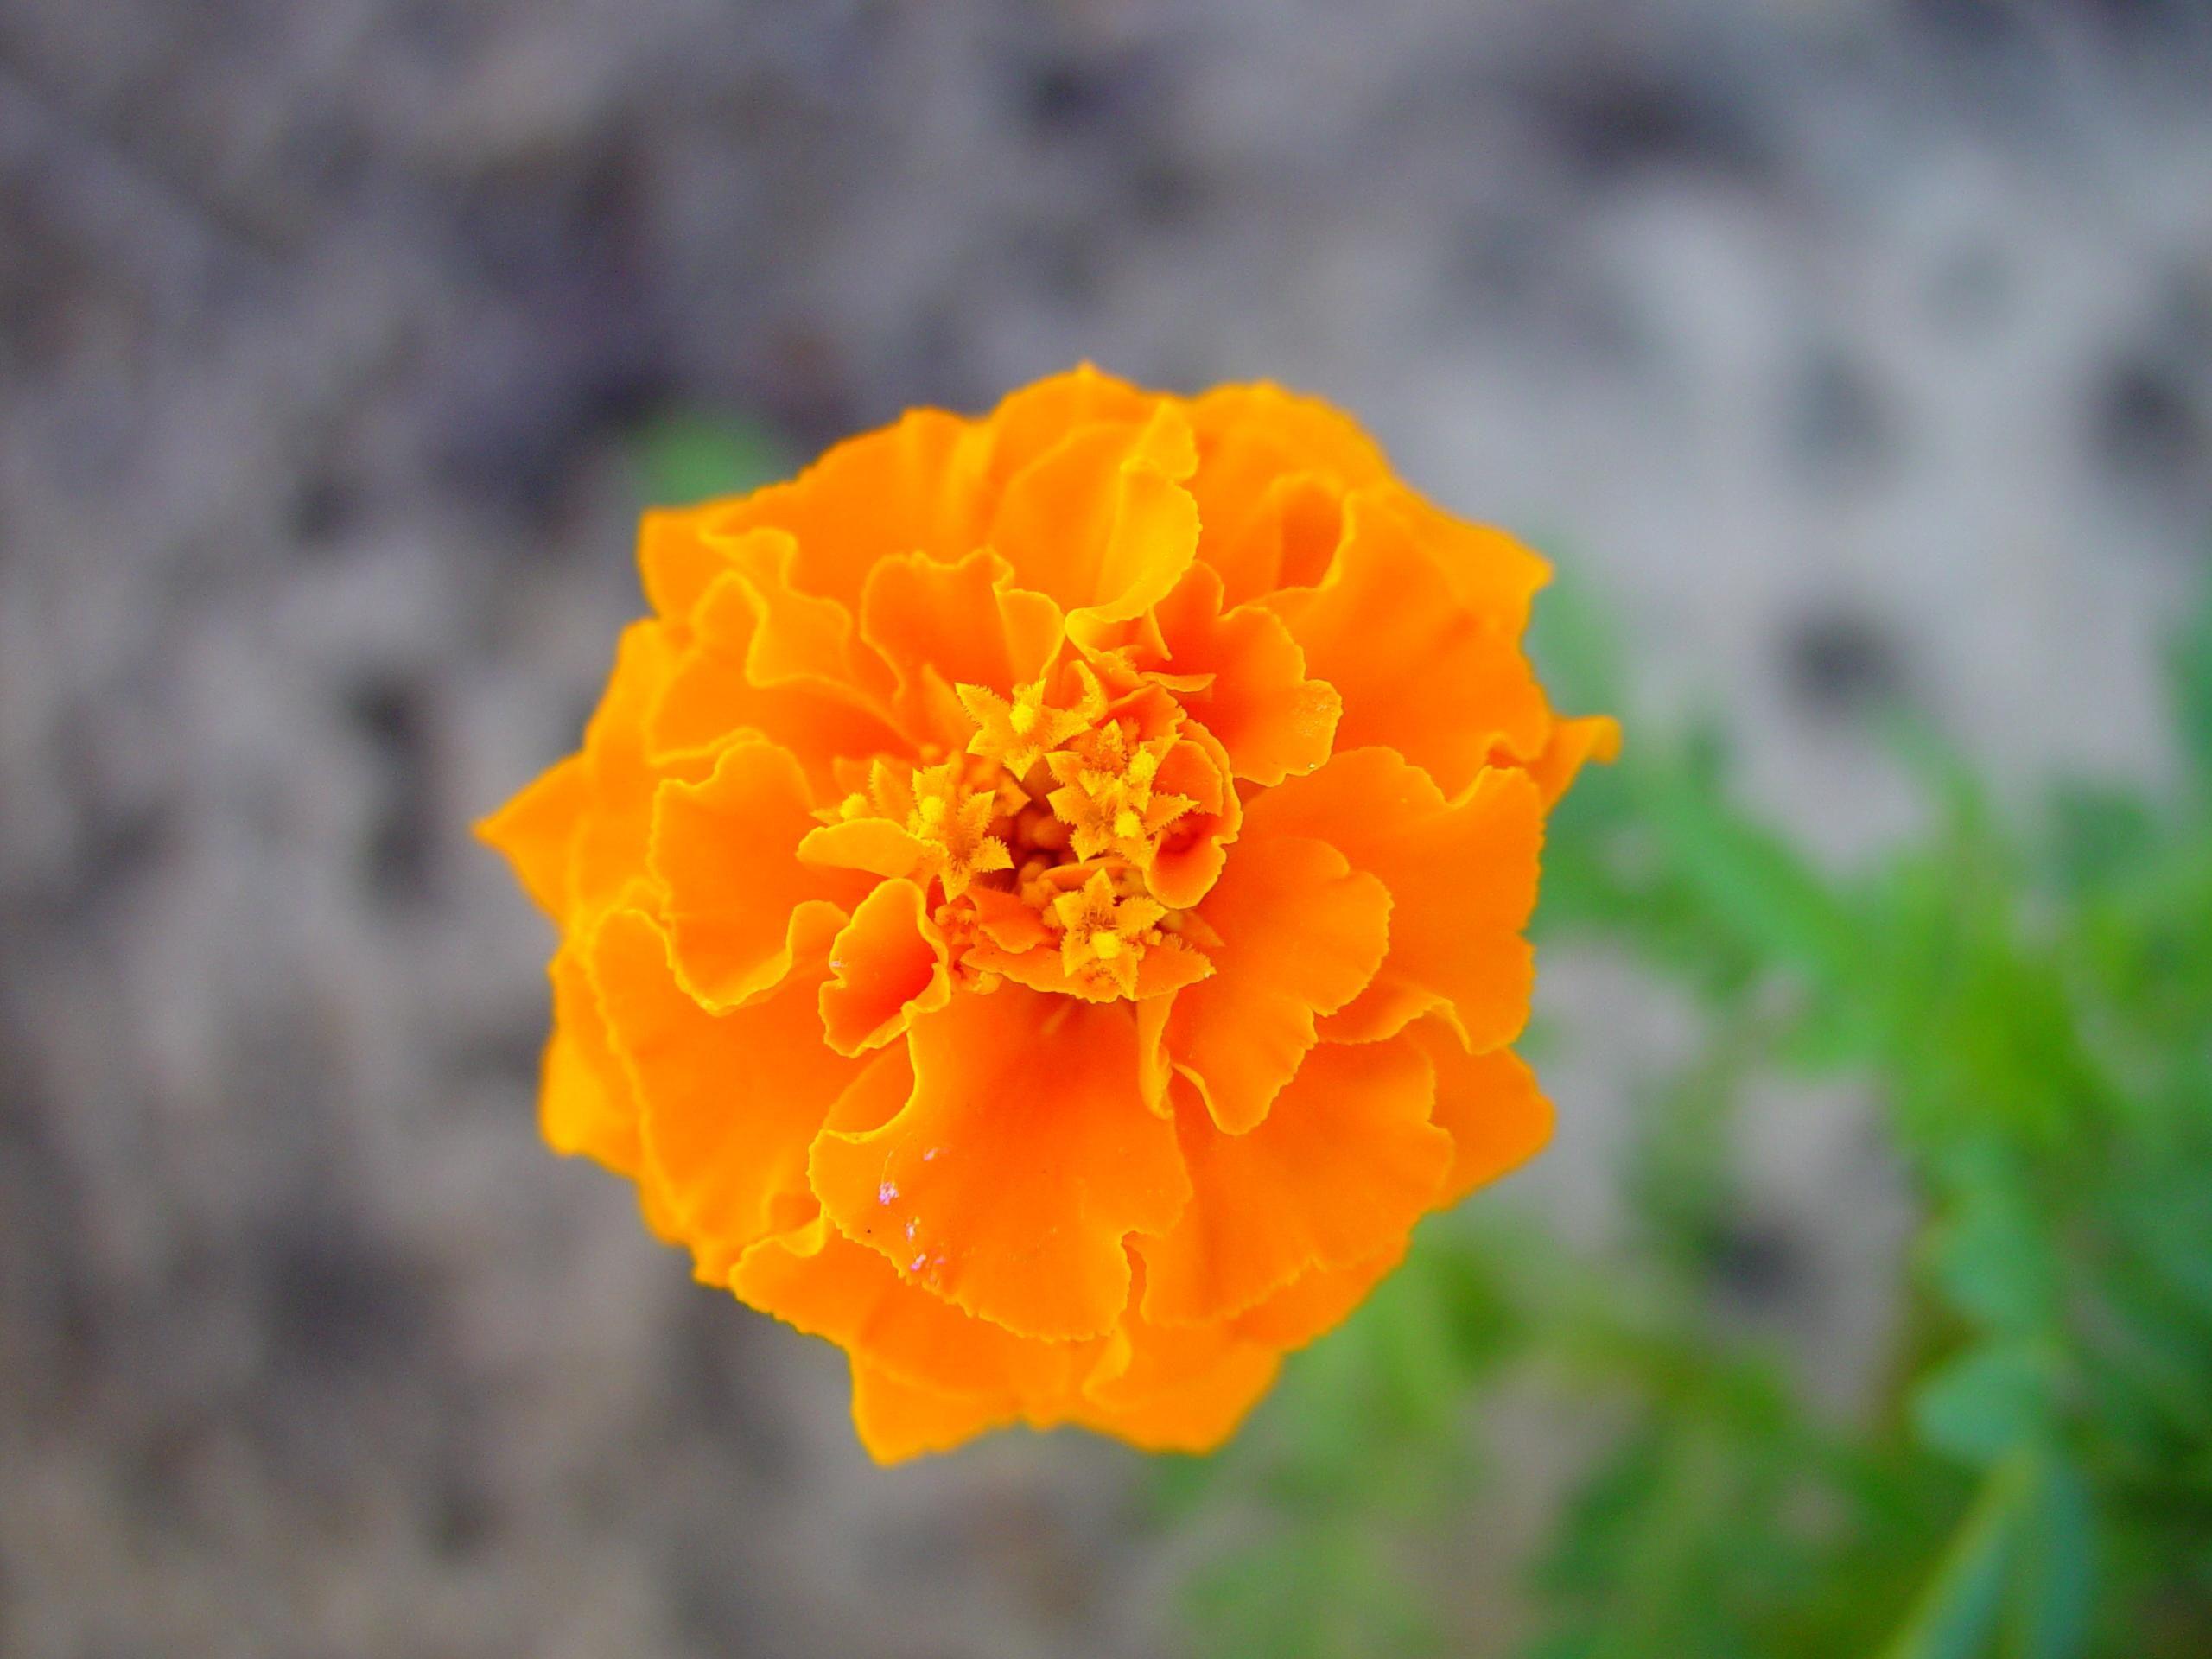 File:Brilliant orange flowers within flowers.jpg - Wikimedia Commons